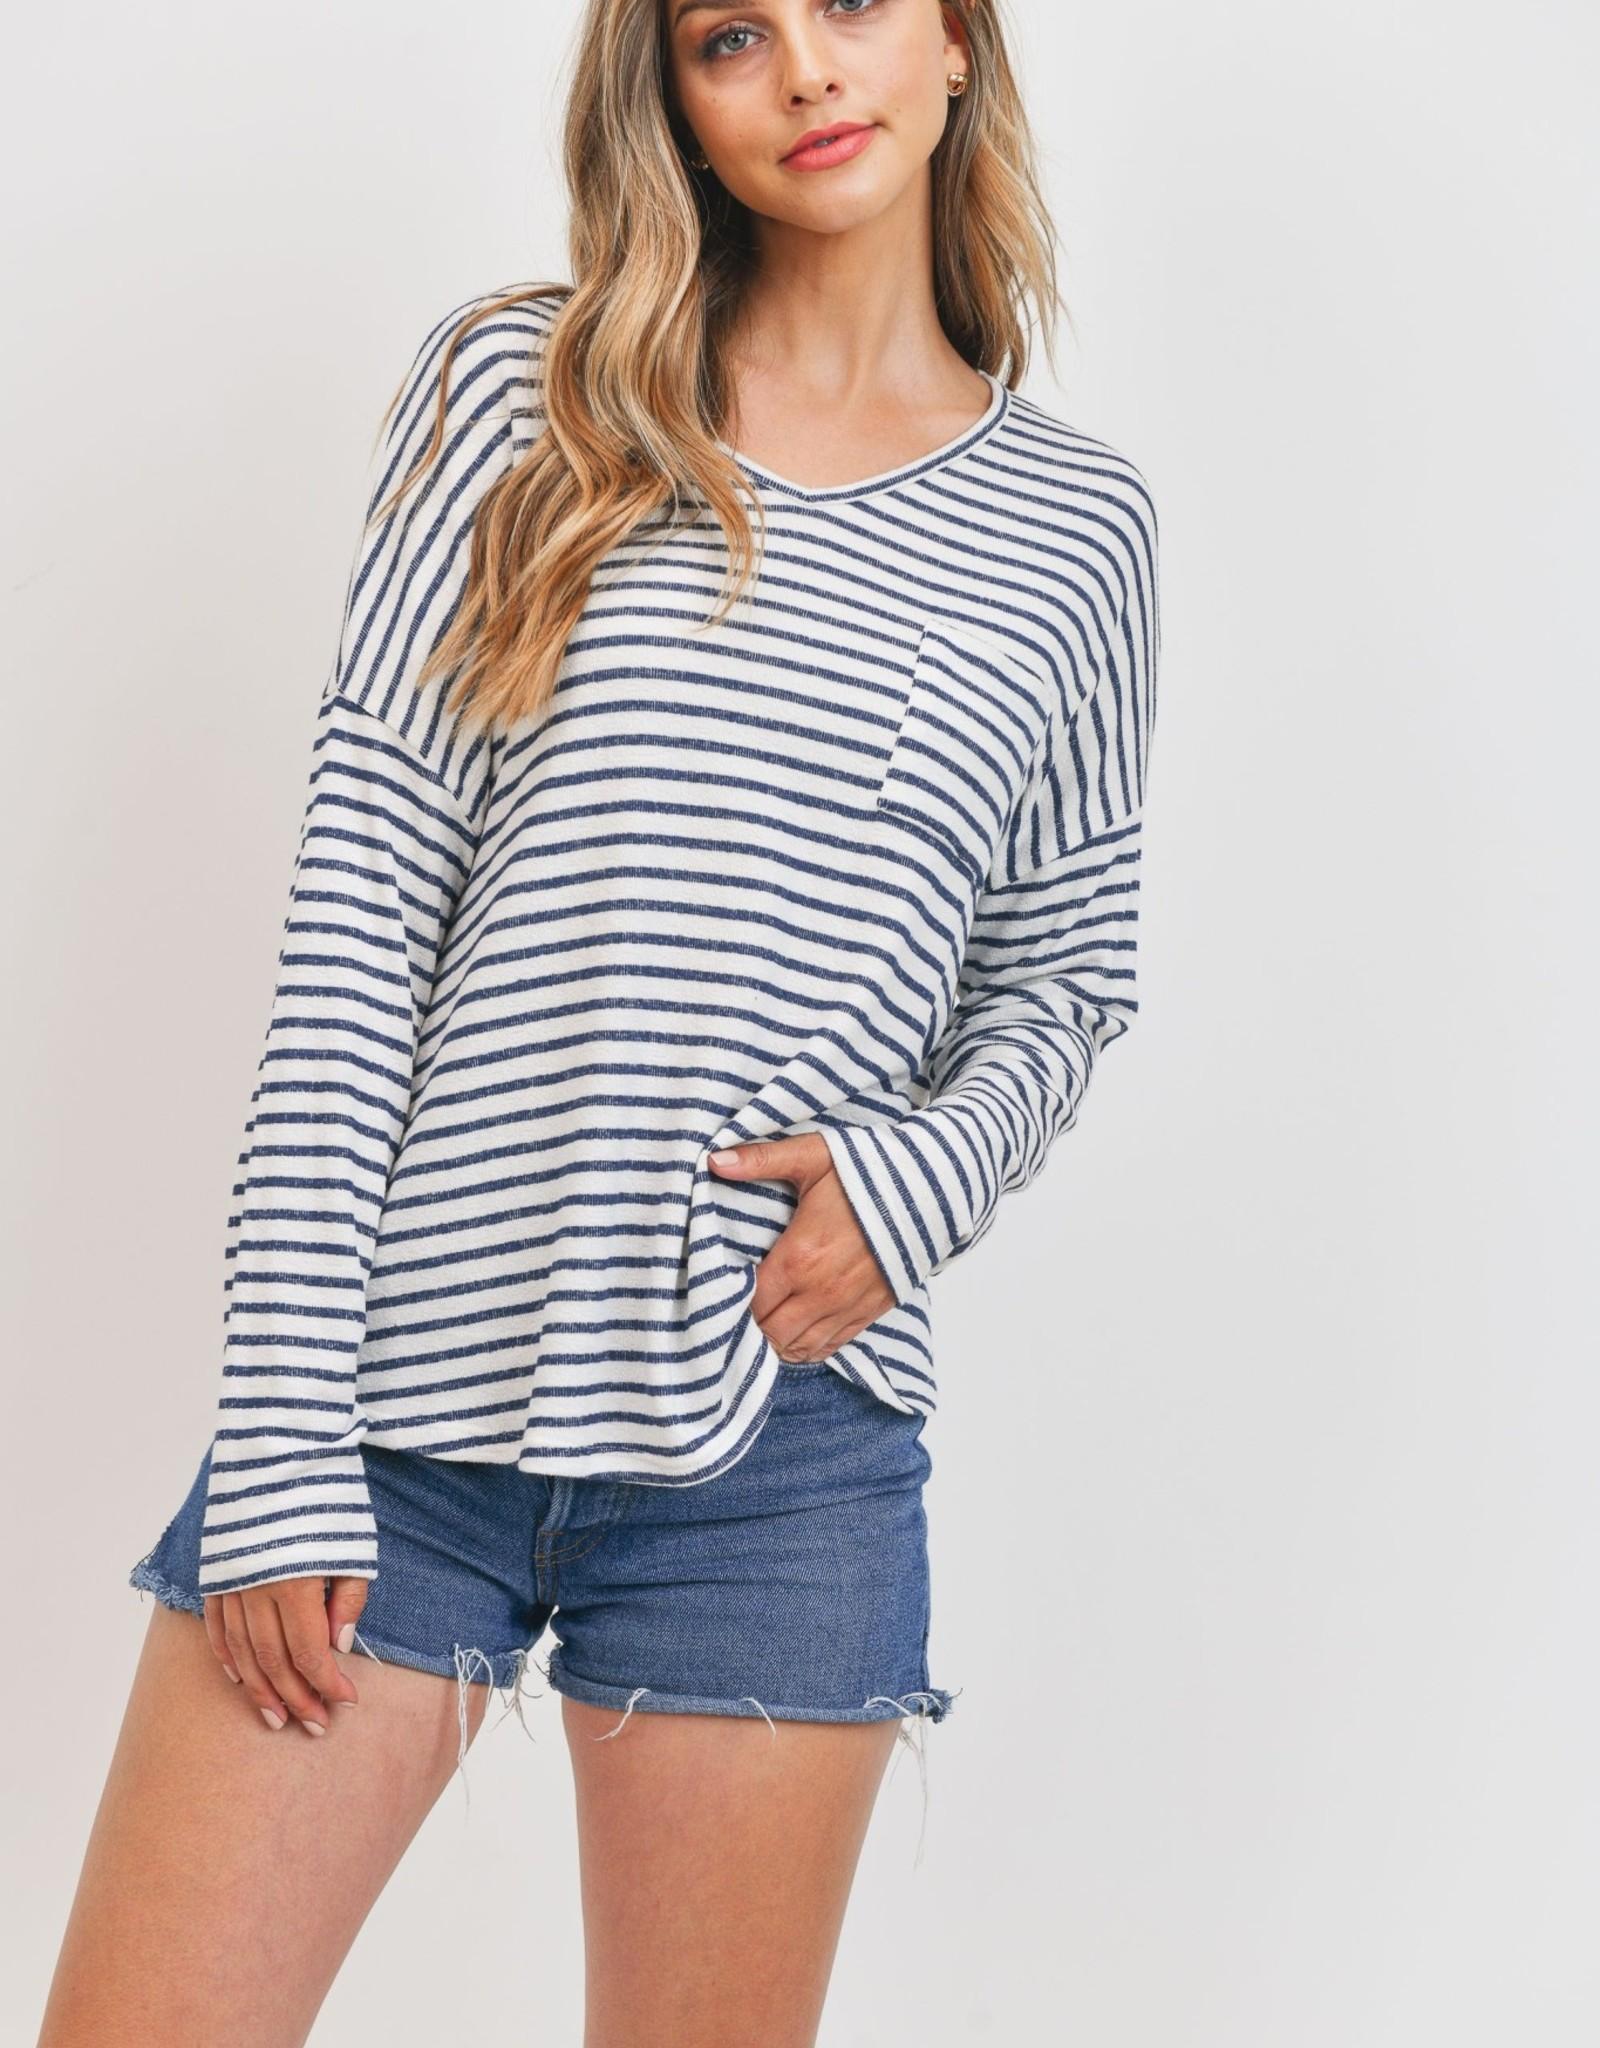 Miss Bliss LS V Neck Striped Knit Top- Navy